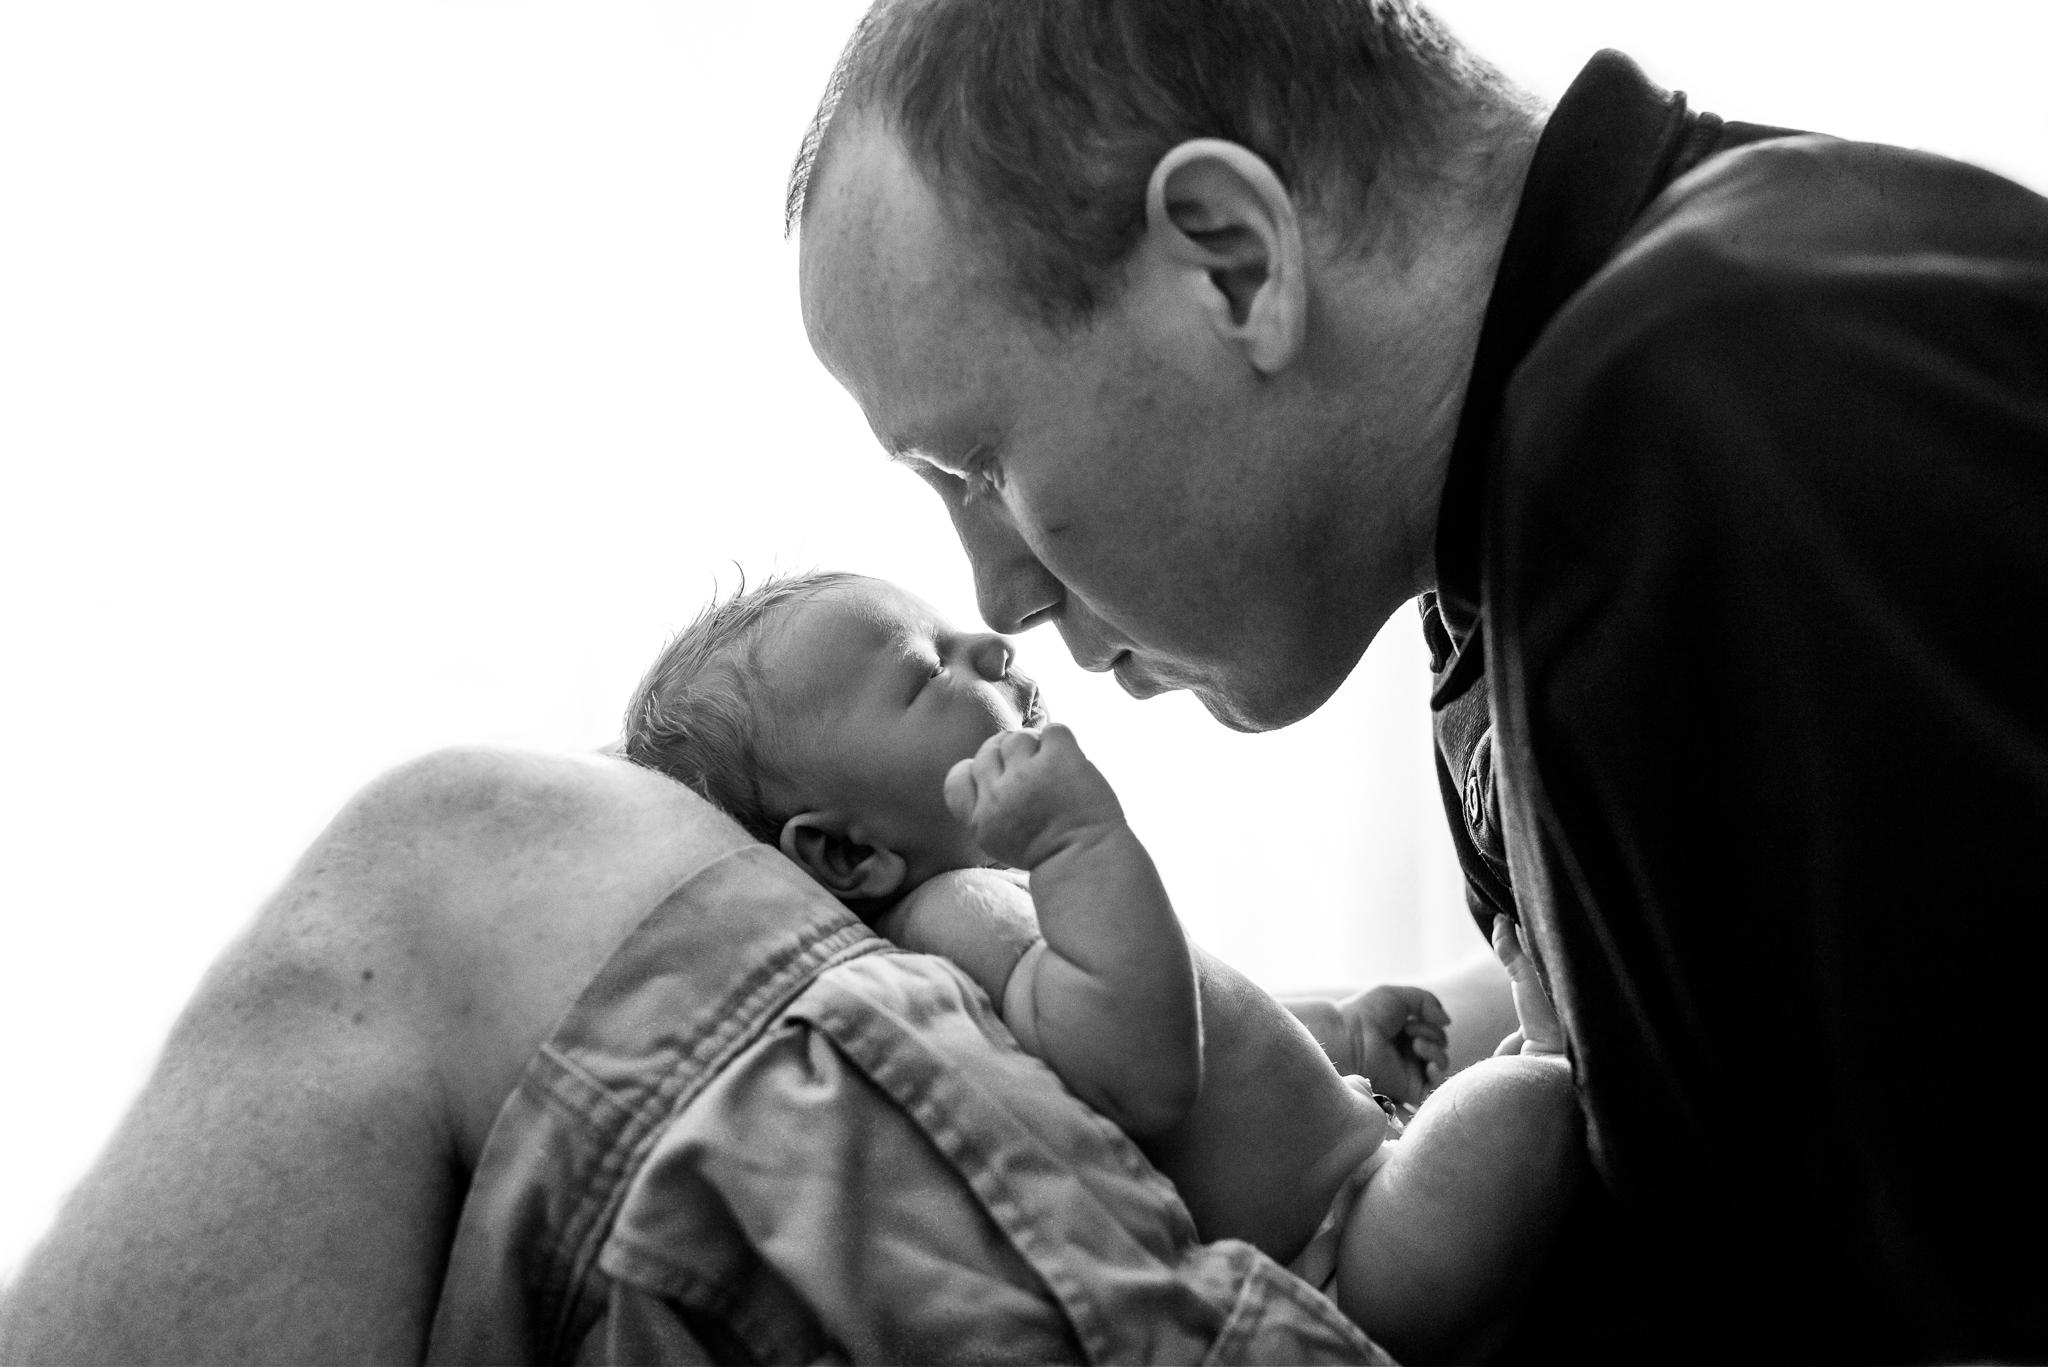 Round Rock Newborn Photographer_Emily Ingalls Photography_Newborn Photoraphy_Pflugerville Newborn Photographer_Hutto Newborn Photographer_Austin Newborn Photographer_Georgetown Newborn Photographer-20.jpg